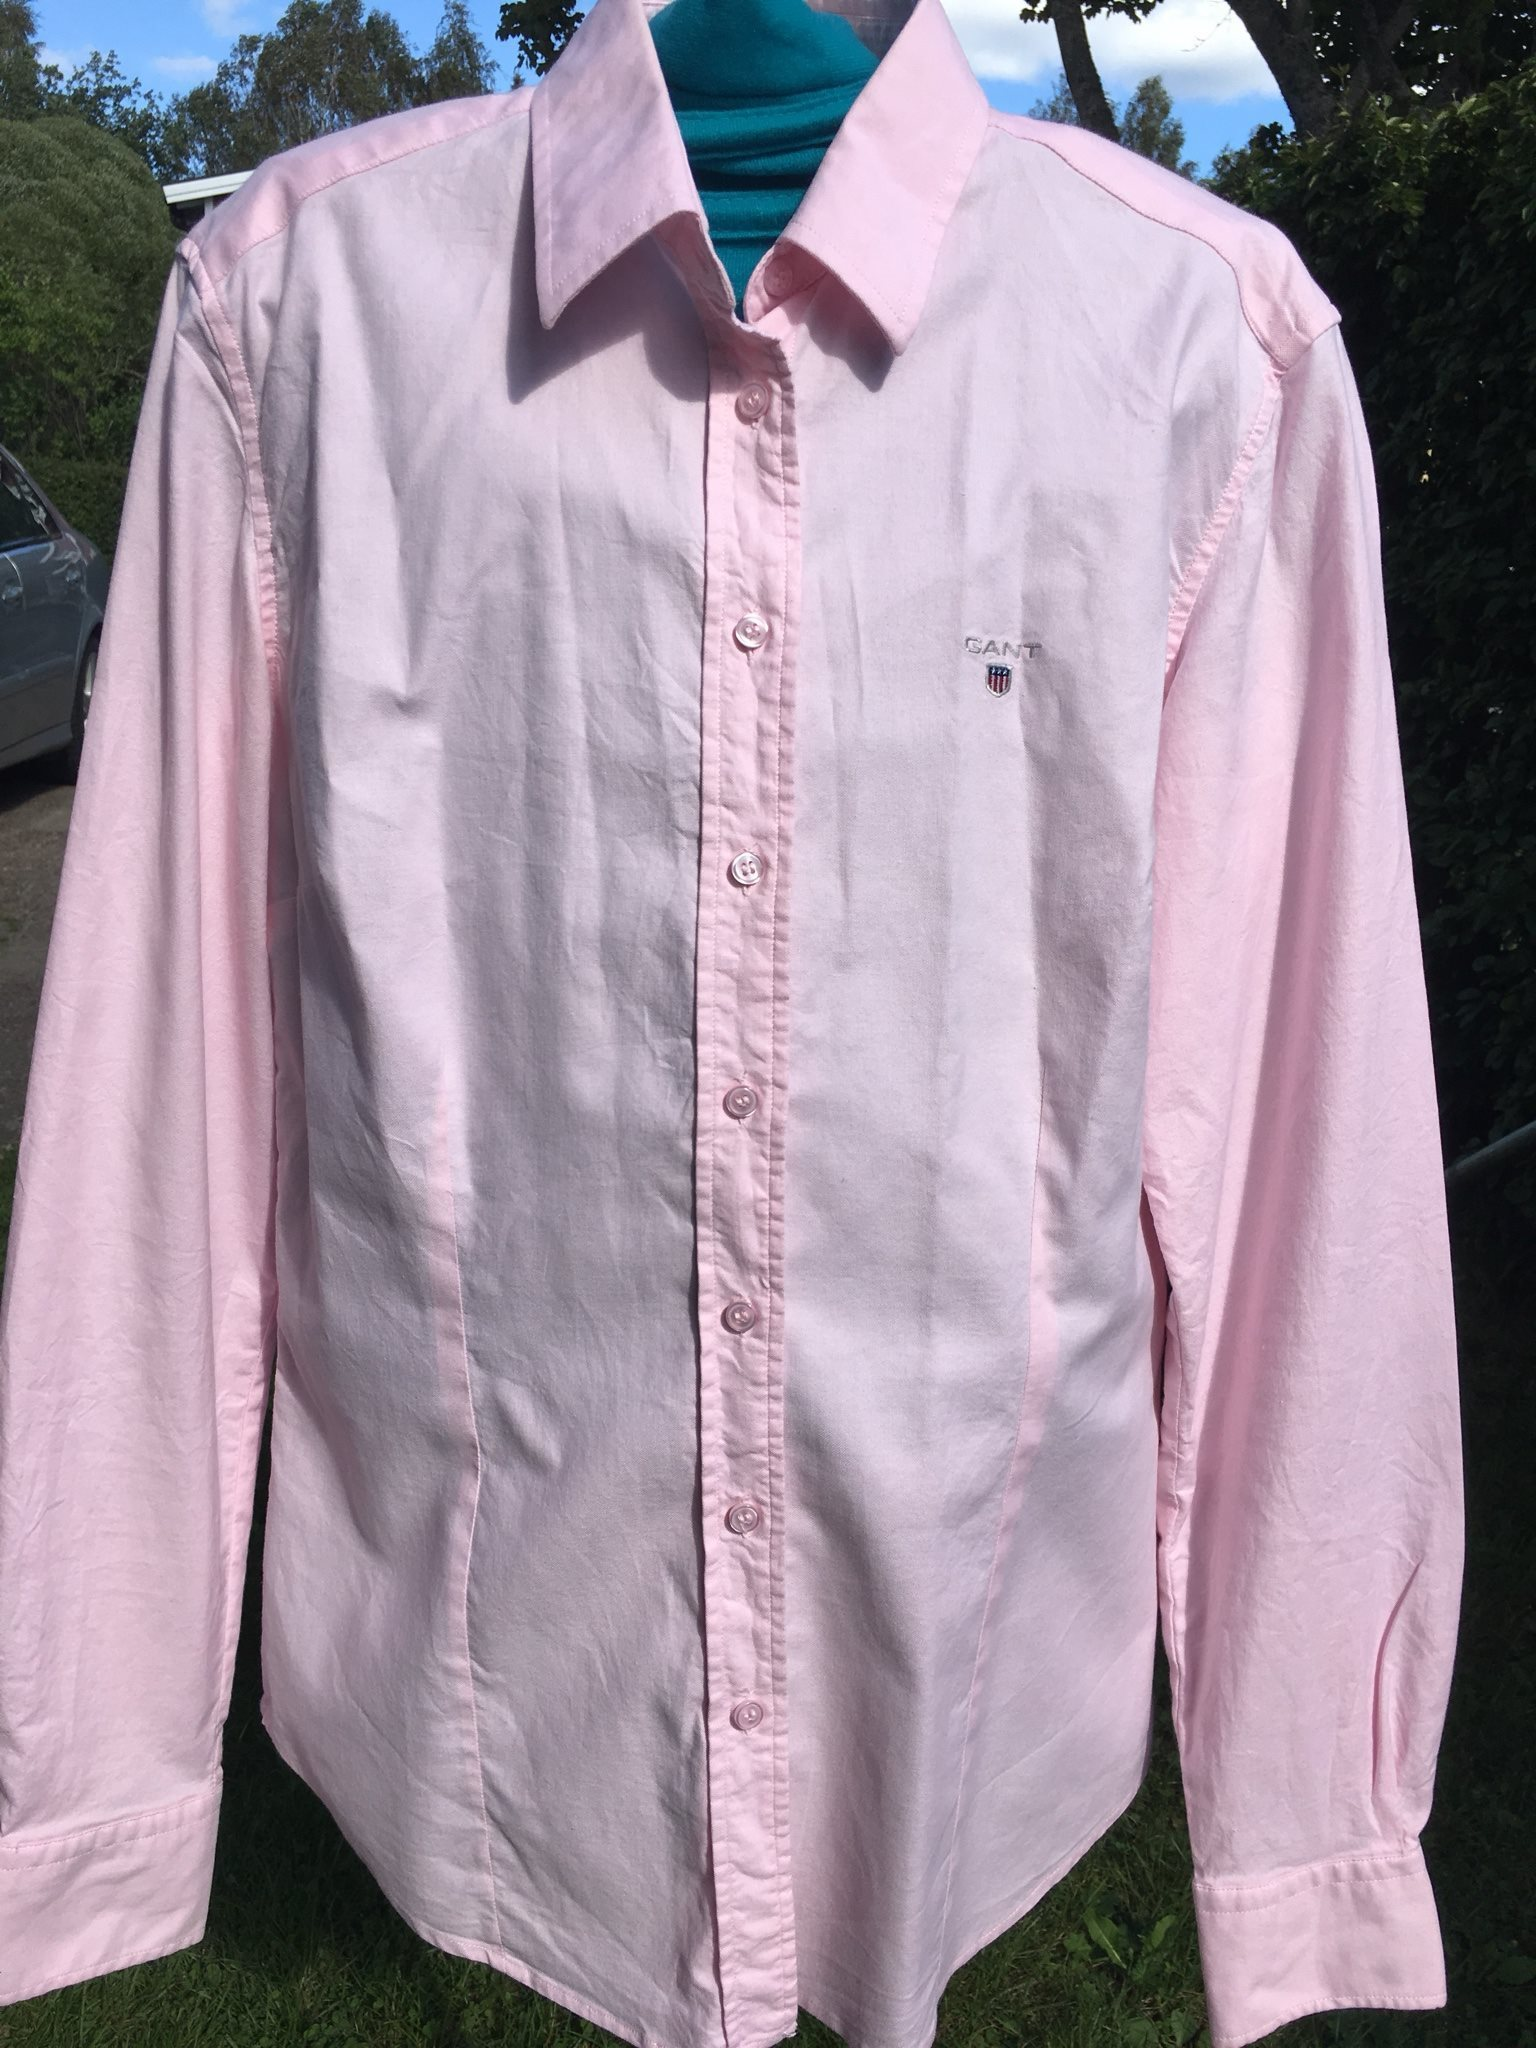 rosa gant skjorta